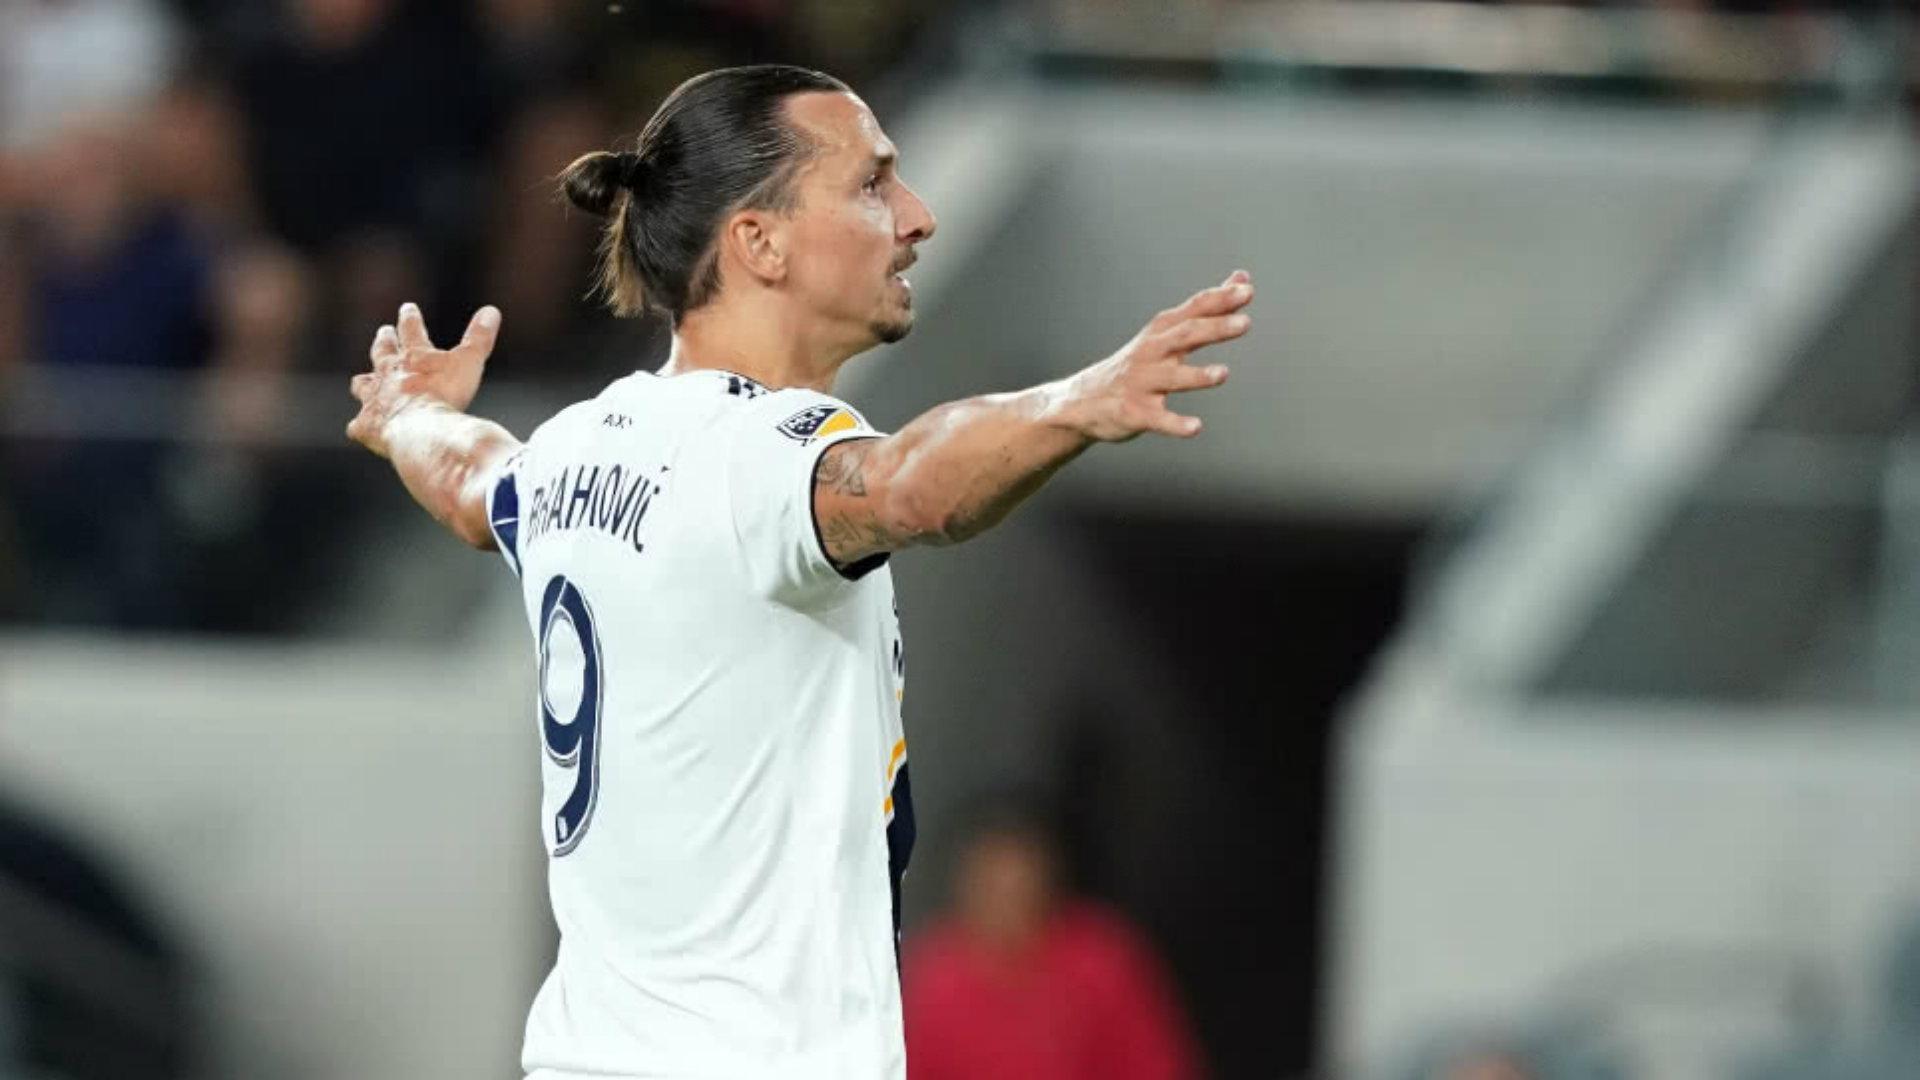 Le club où Zlatan veut finir sa carrière — MERCATO